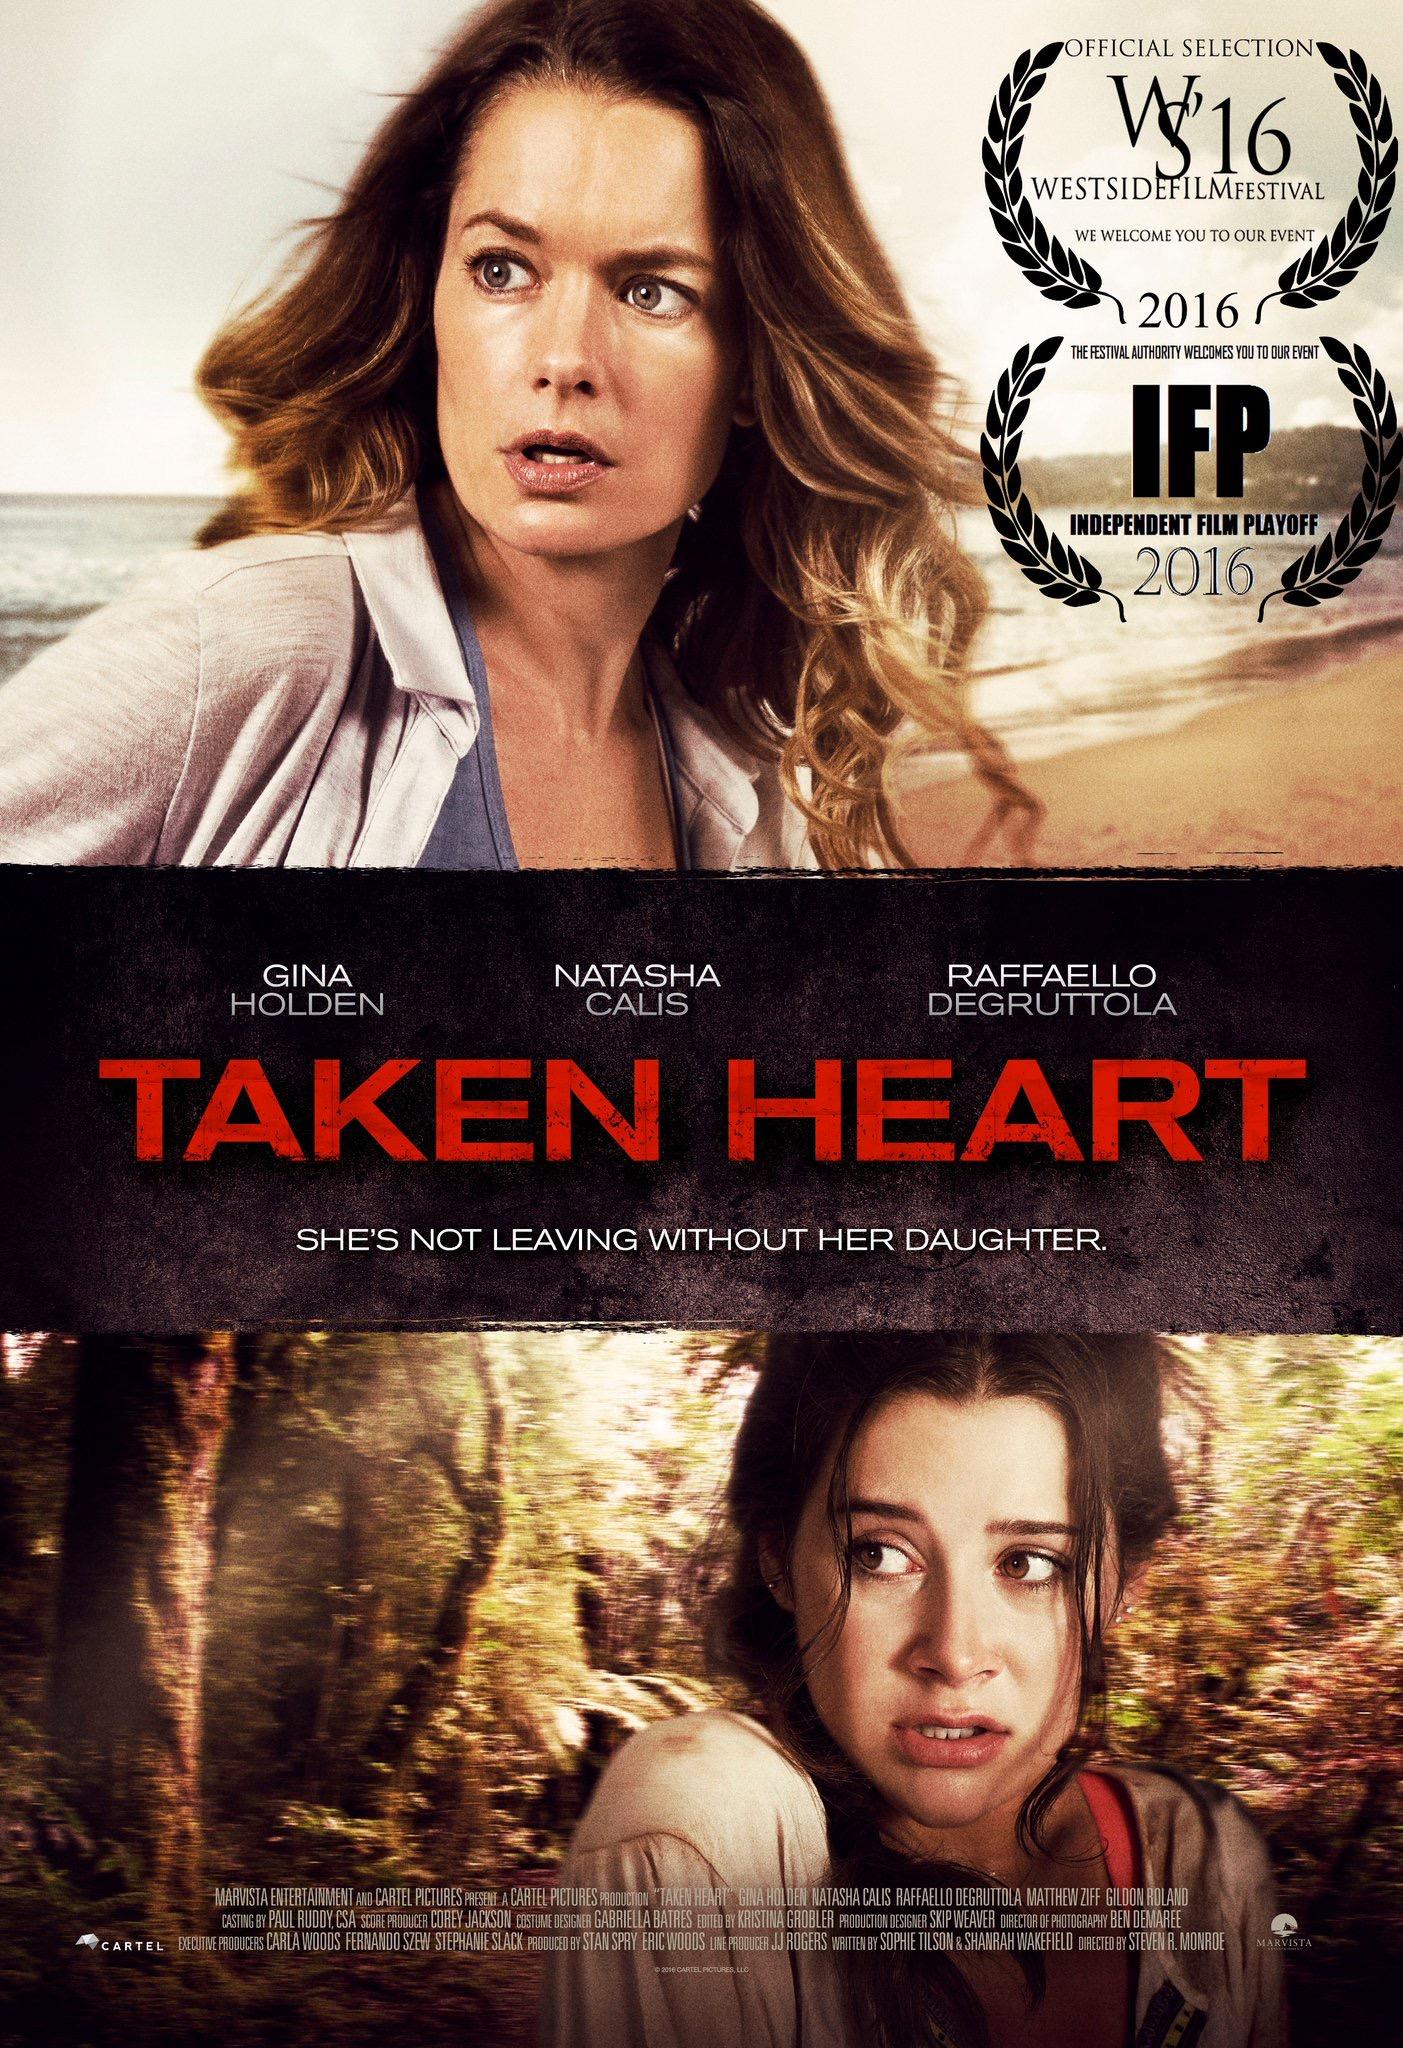 taken heart full movie download full movies streaming